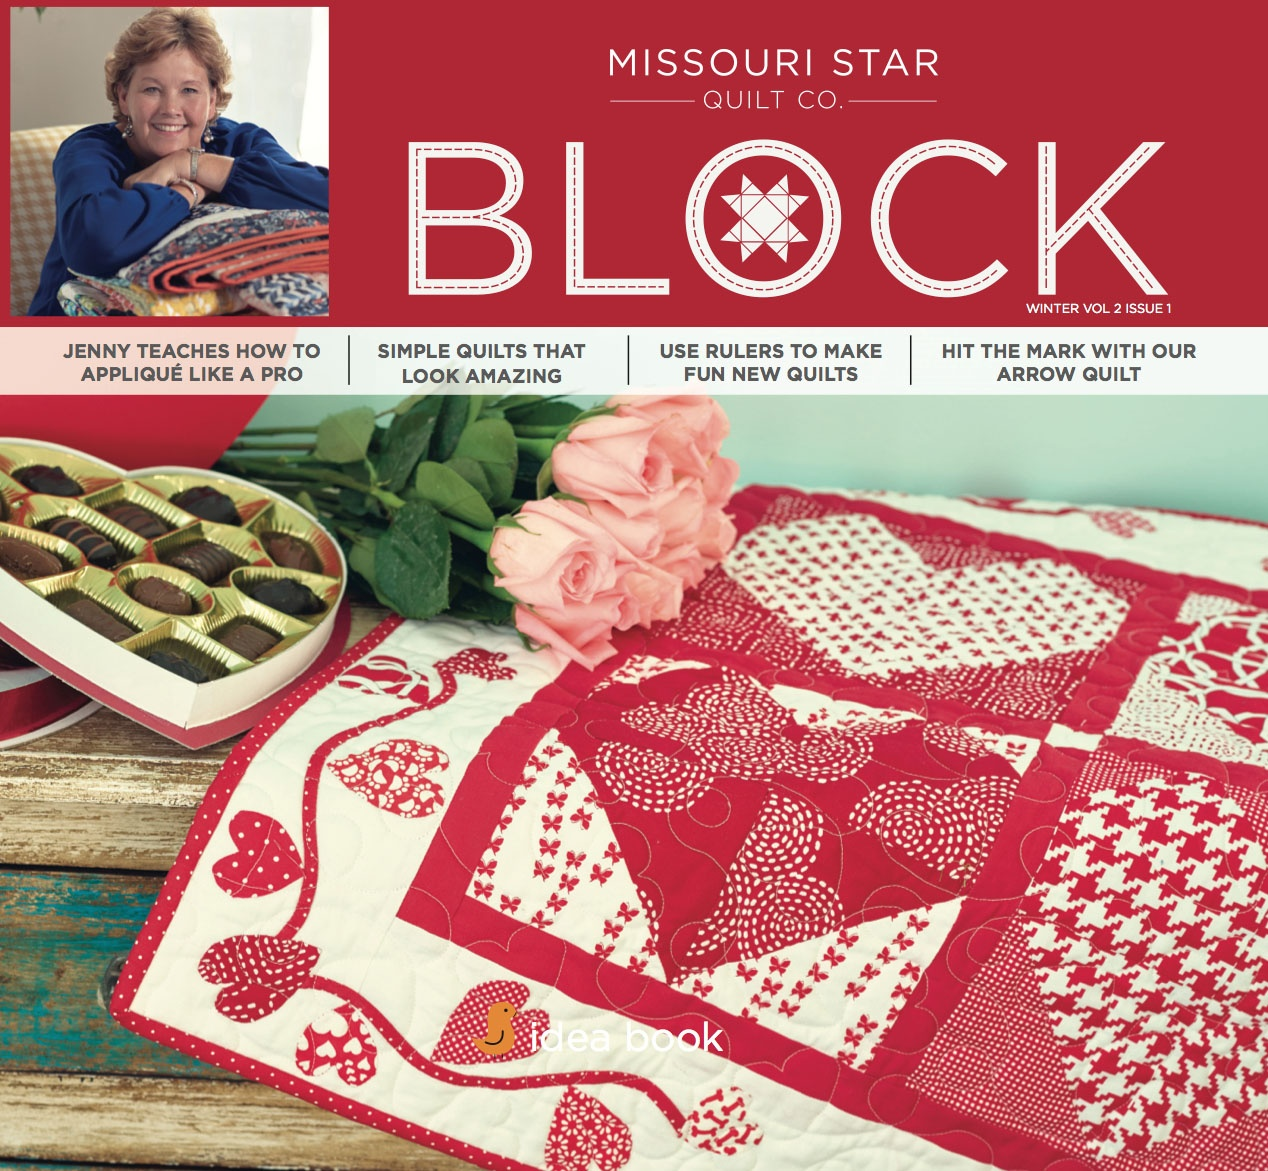 BLOCK Magazine Winter 2015 - Vol.2 Issue 1